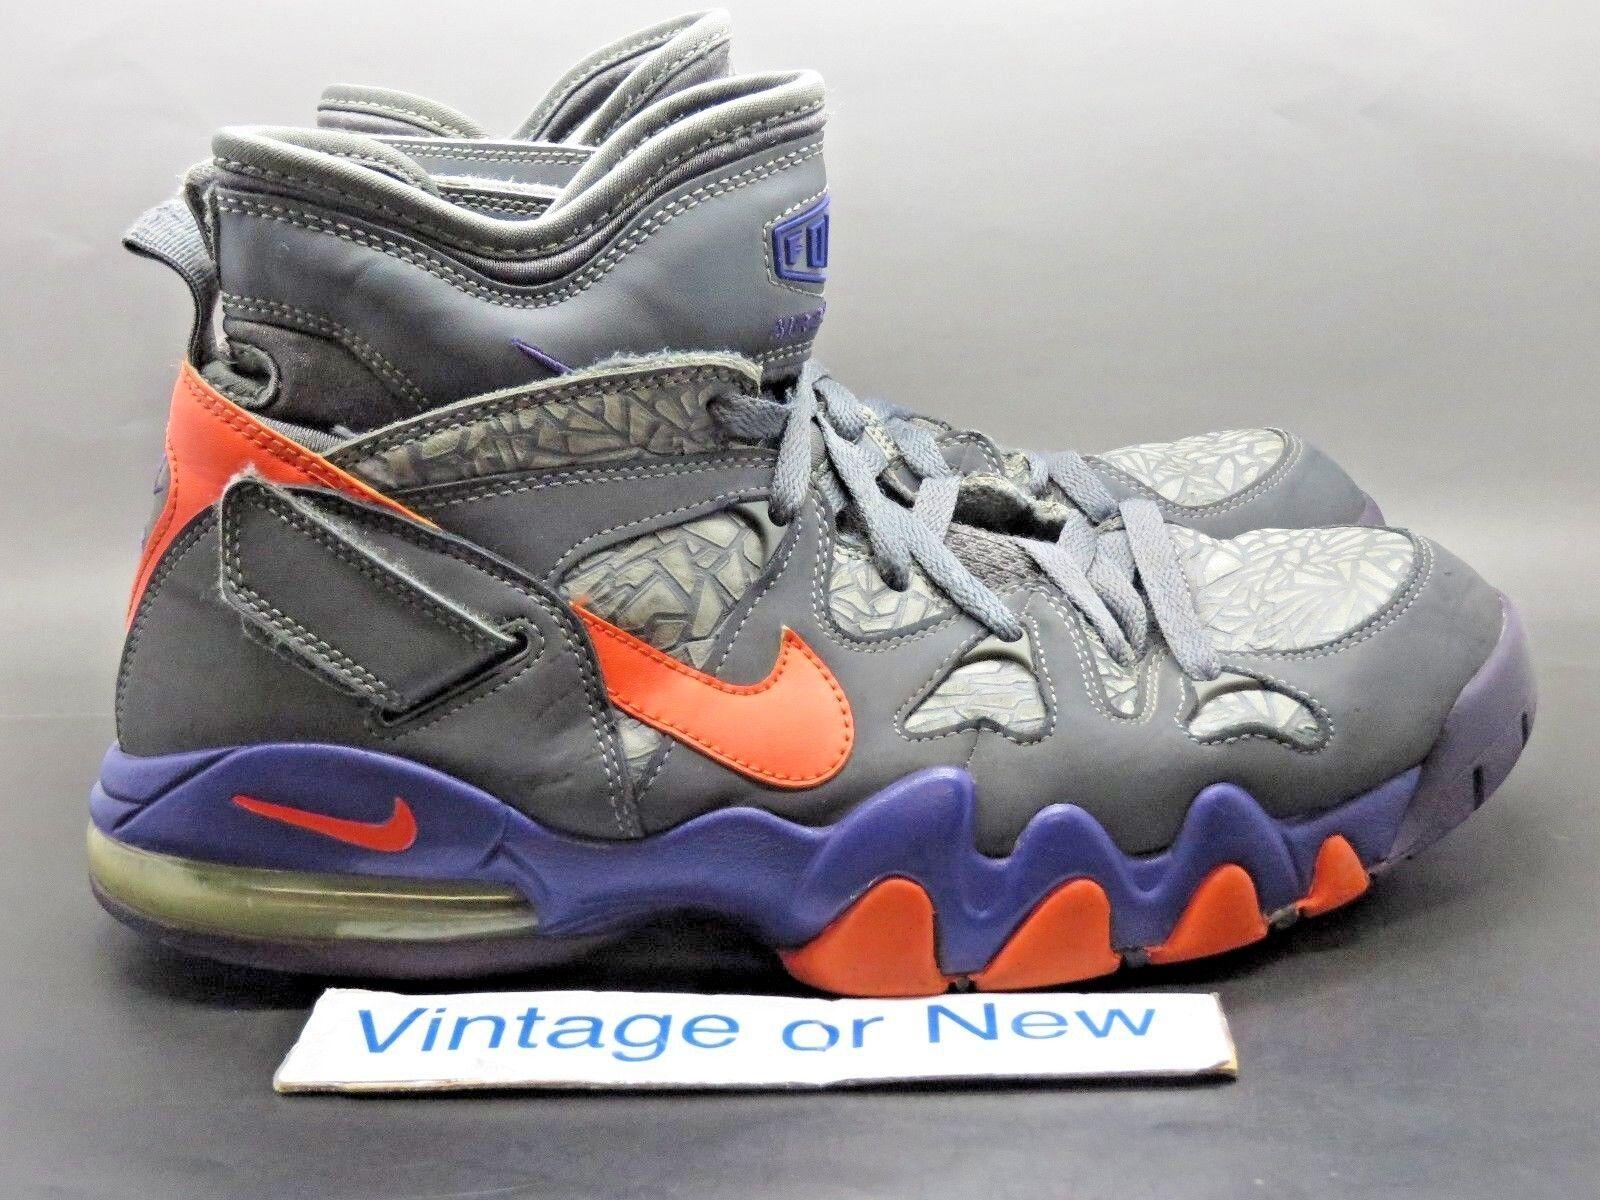 best website d2b09 e284f Nike Air Max Strong II 2 Phoenix Phoenix Phoenix Suns 2013 sz 10.5 7eb21a